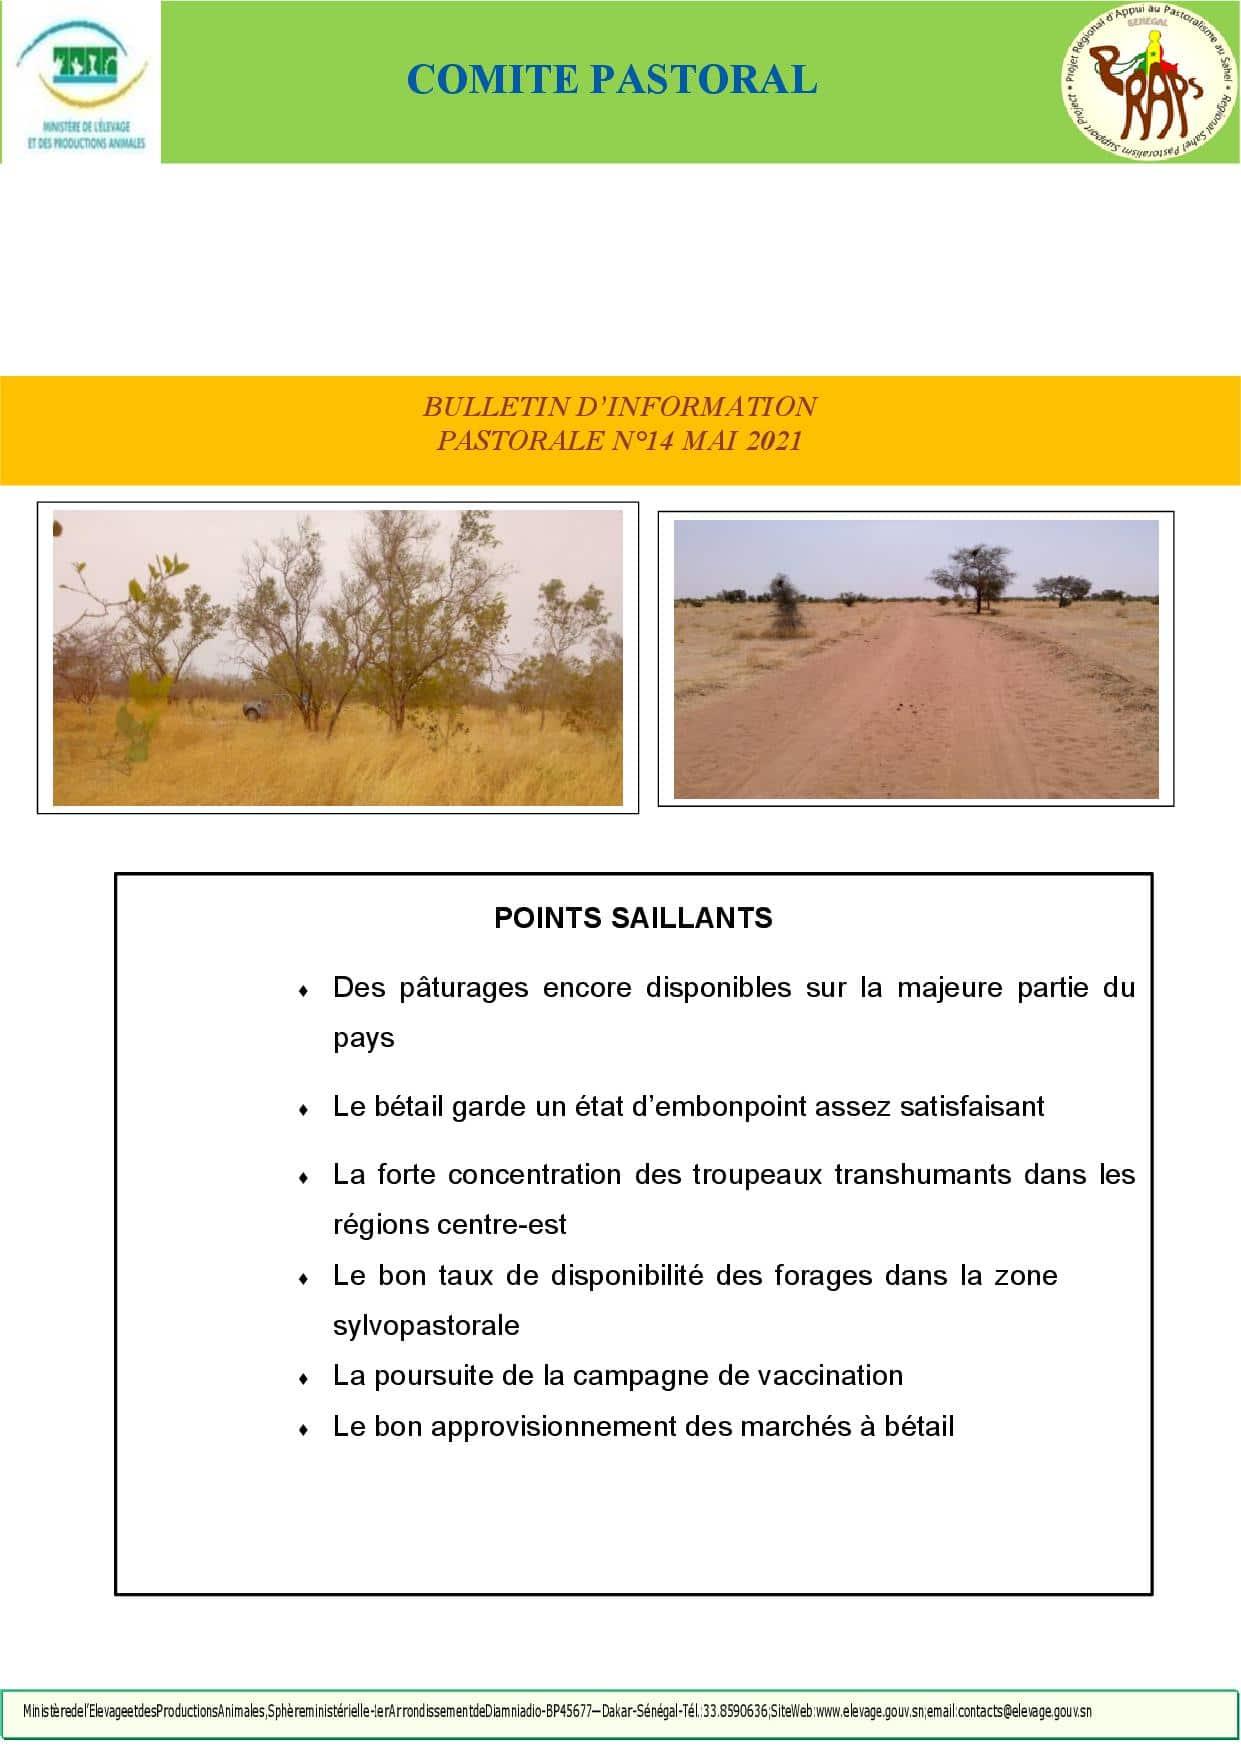 Bulletin d'information pastorale N°14